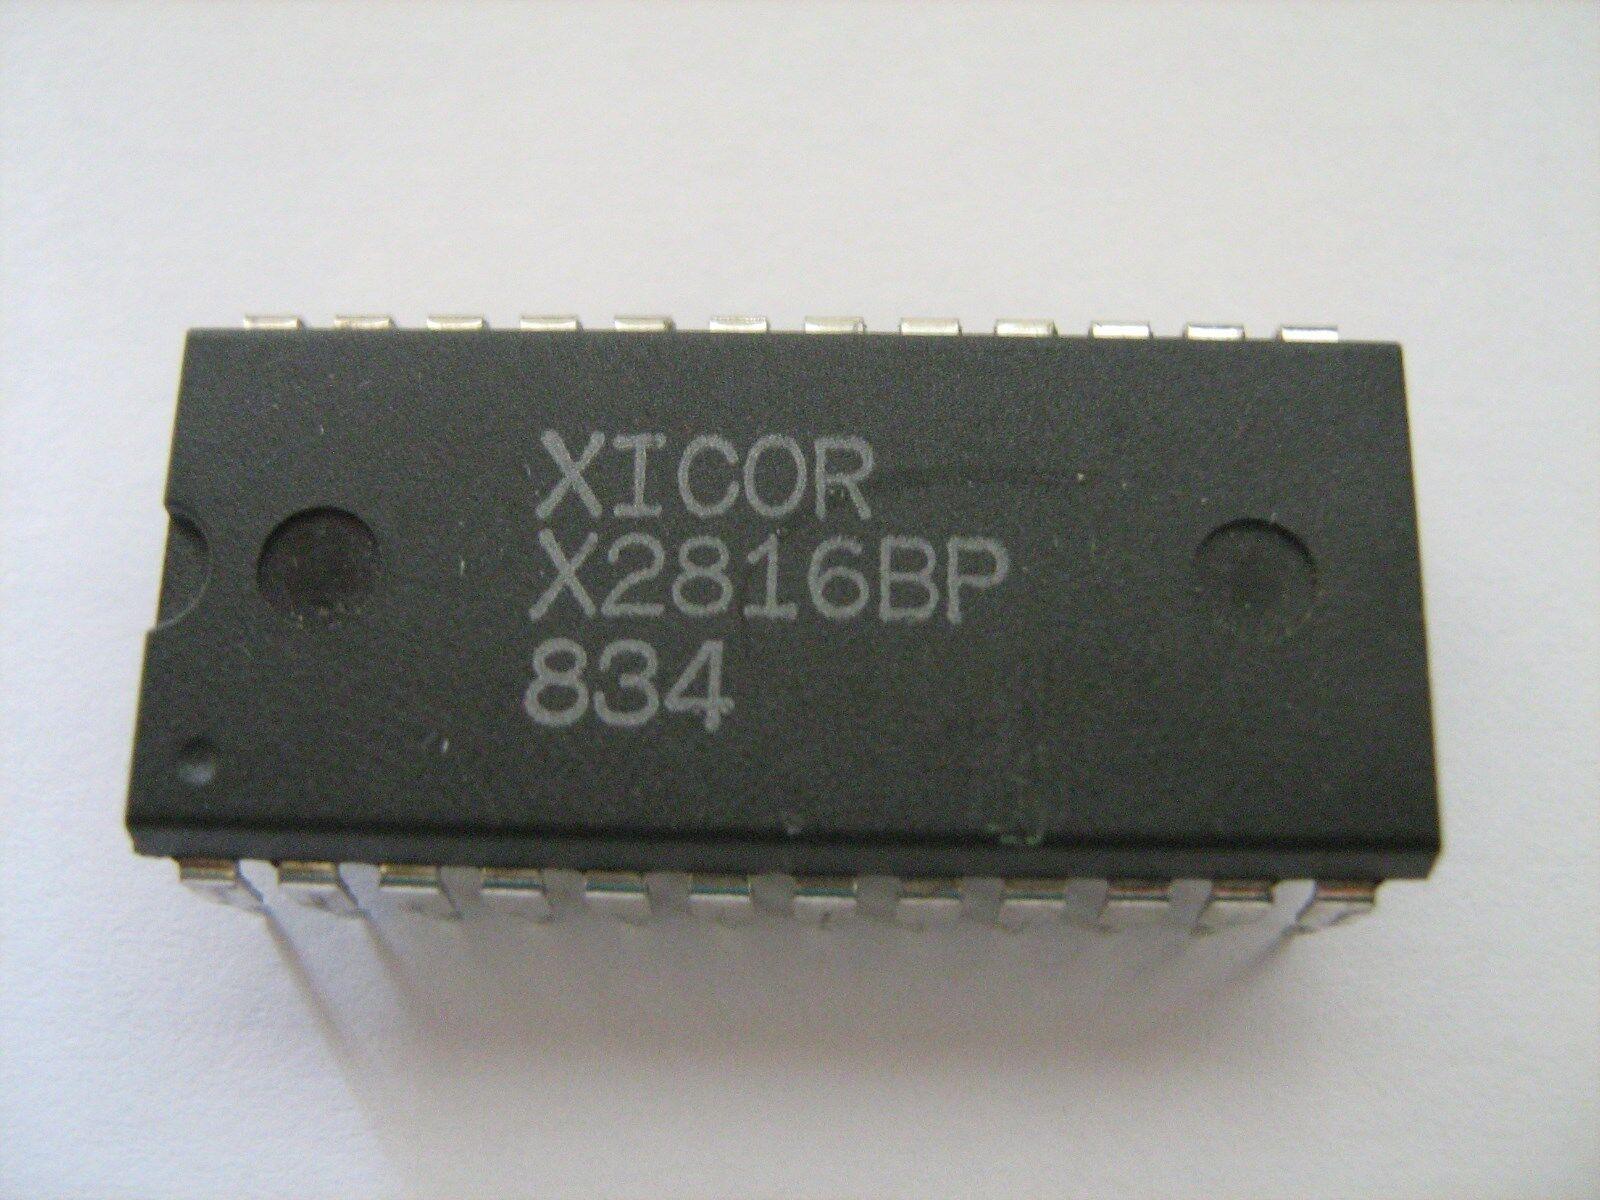 Ledlenser Schlüsselanhänger mit LED Lampe Taschenlampe abnehmbar 7155+7608